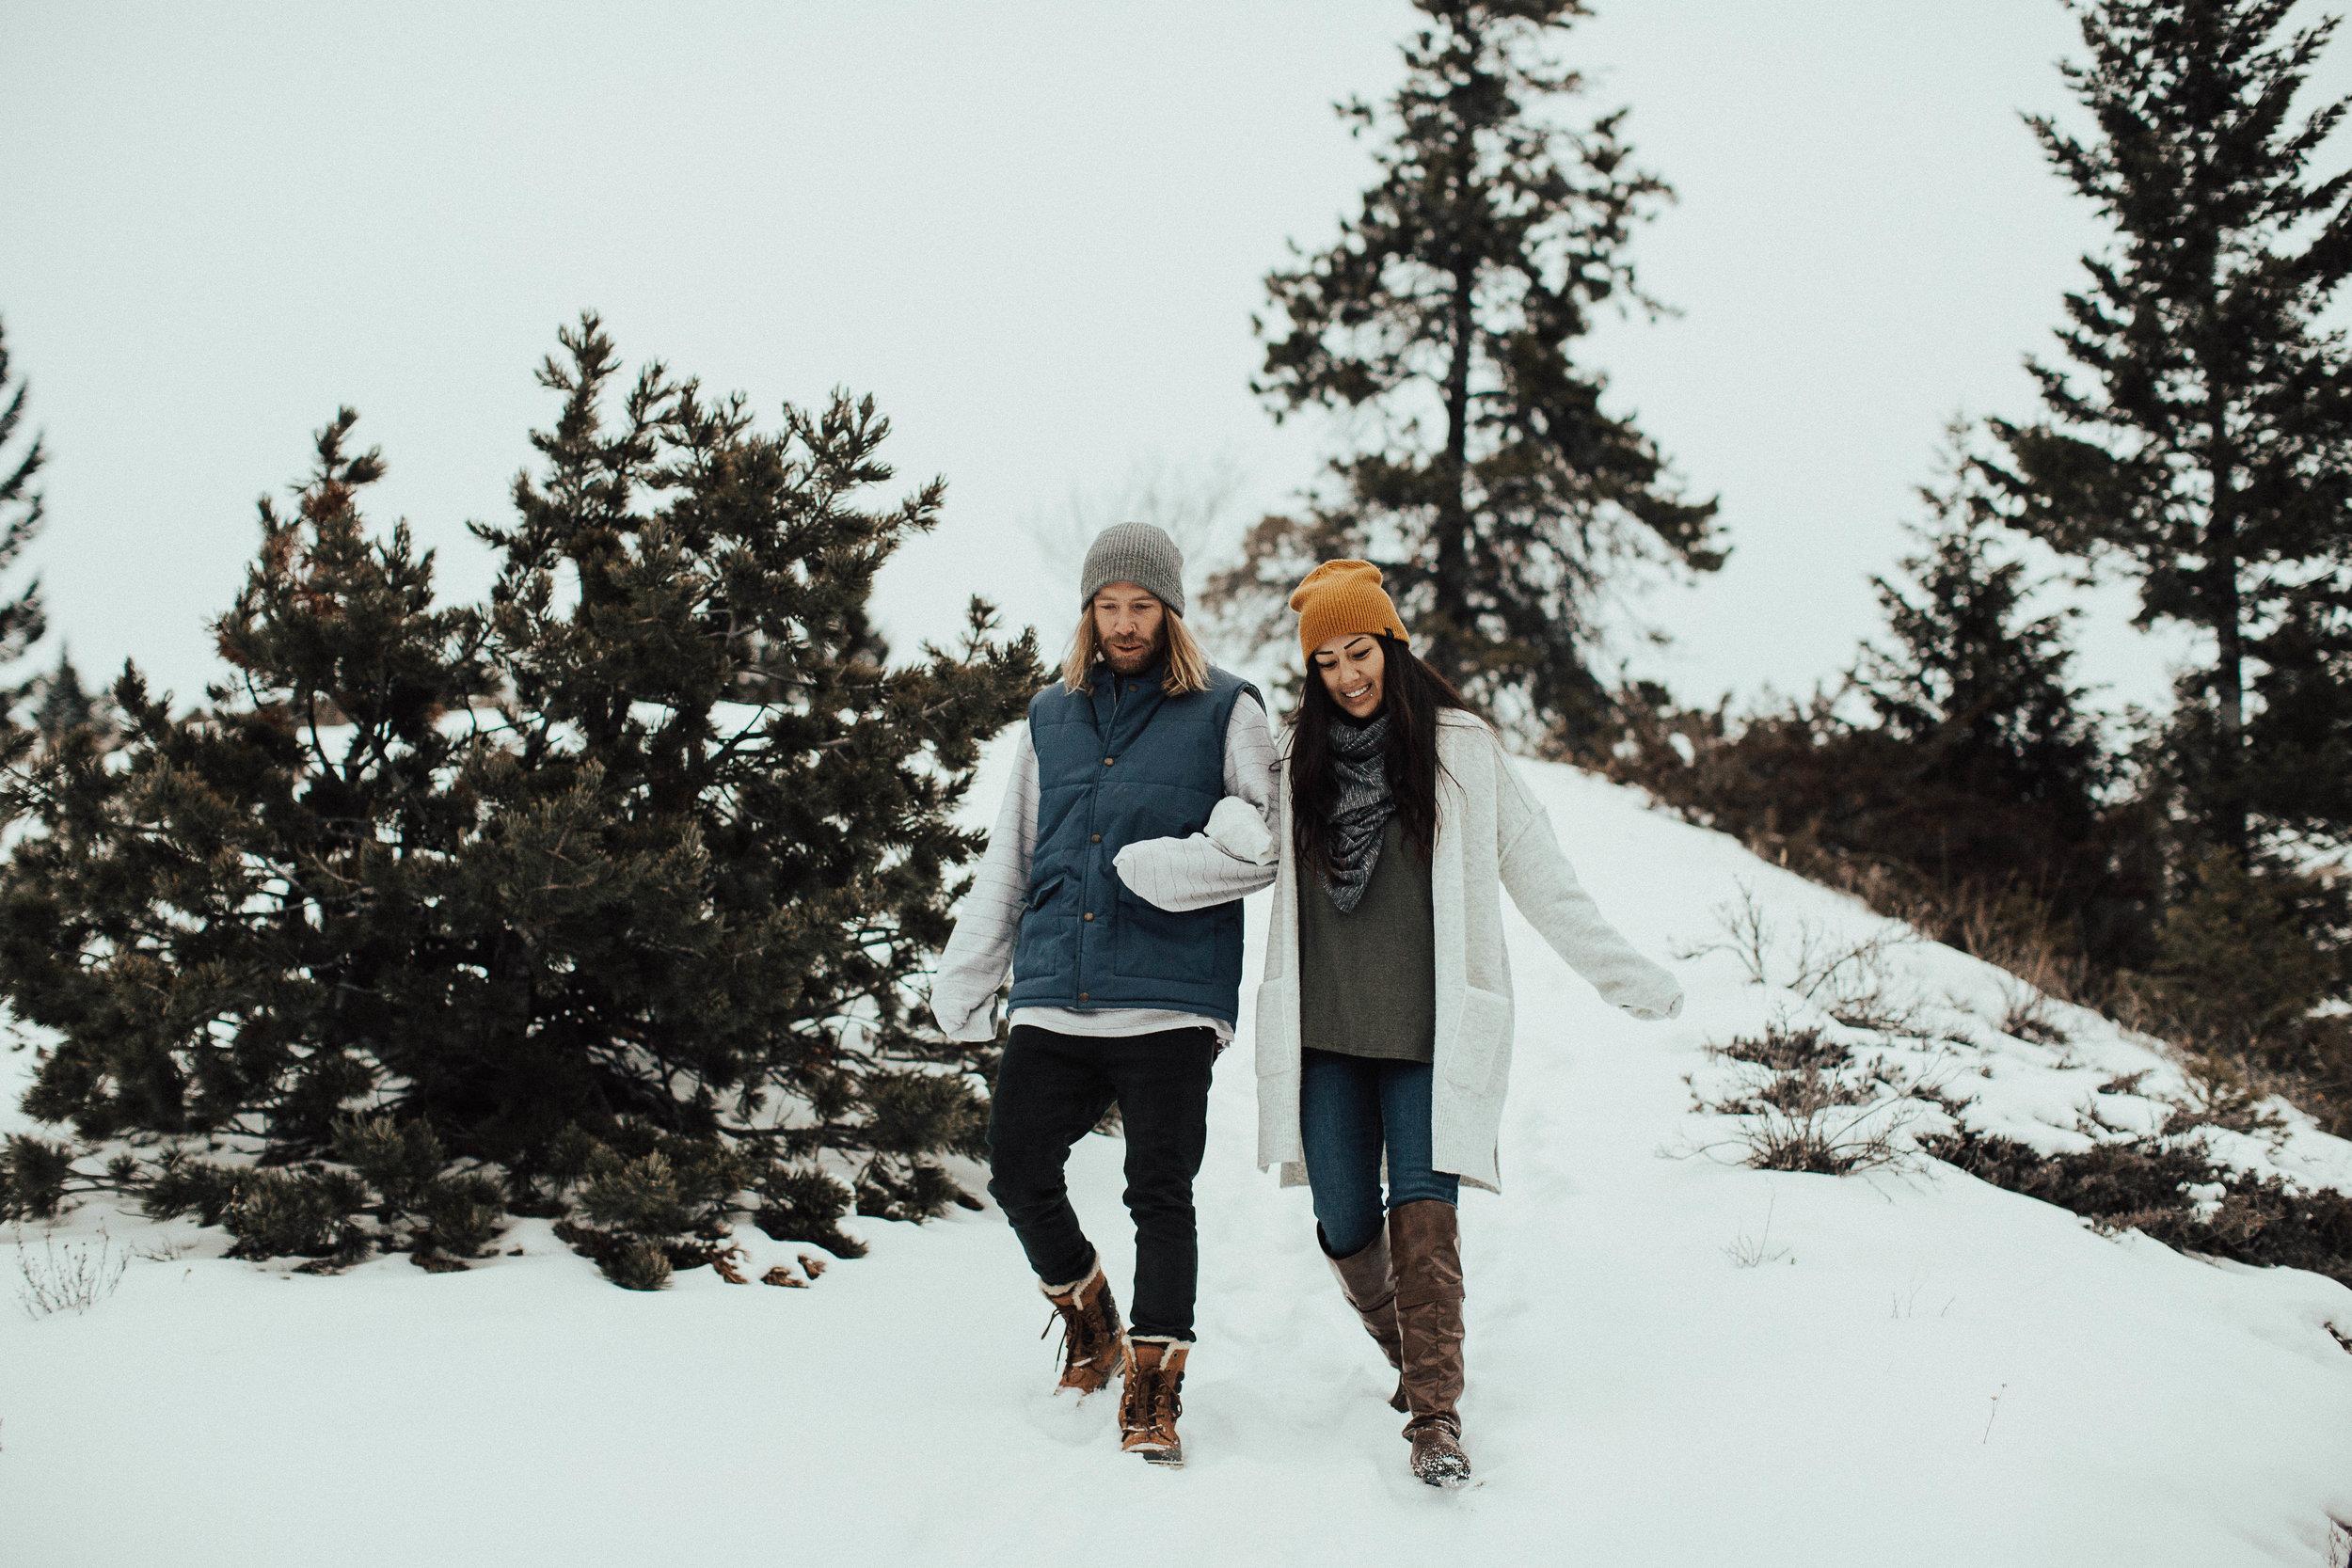 Banff Engagement Photographer - Winter Mountain Adventure Engagement Session - Michelle Larmand Photography-014